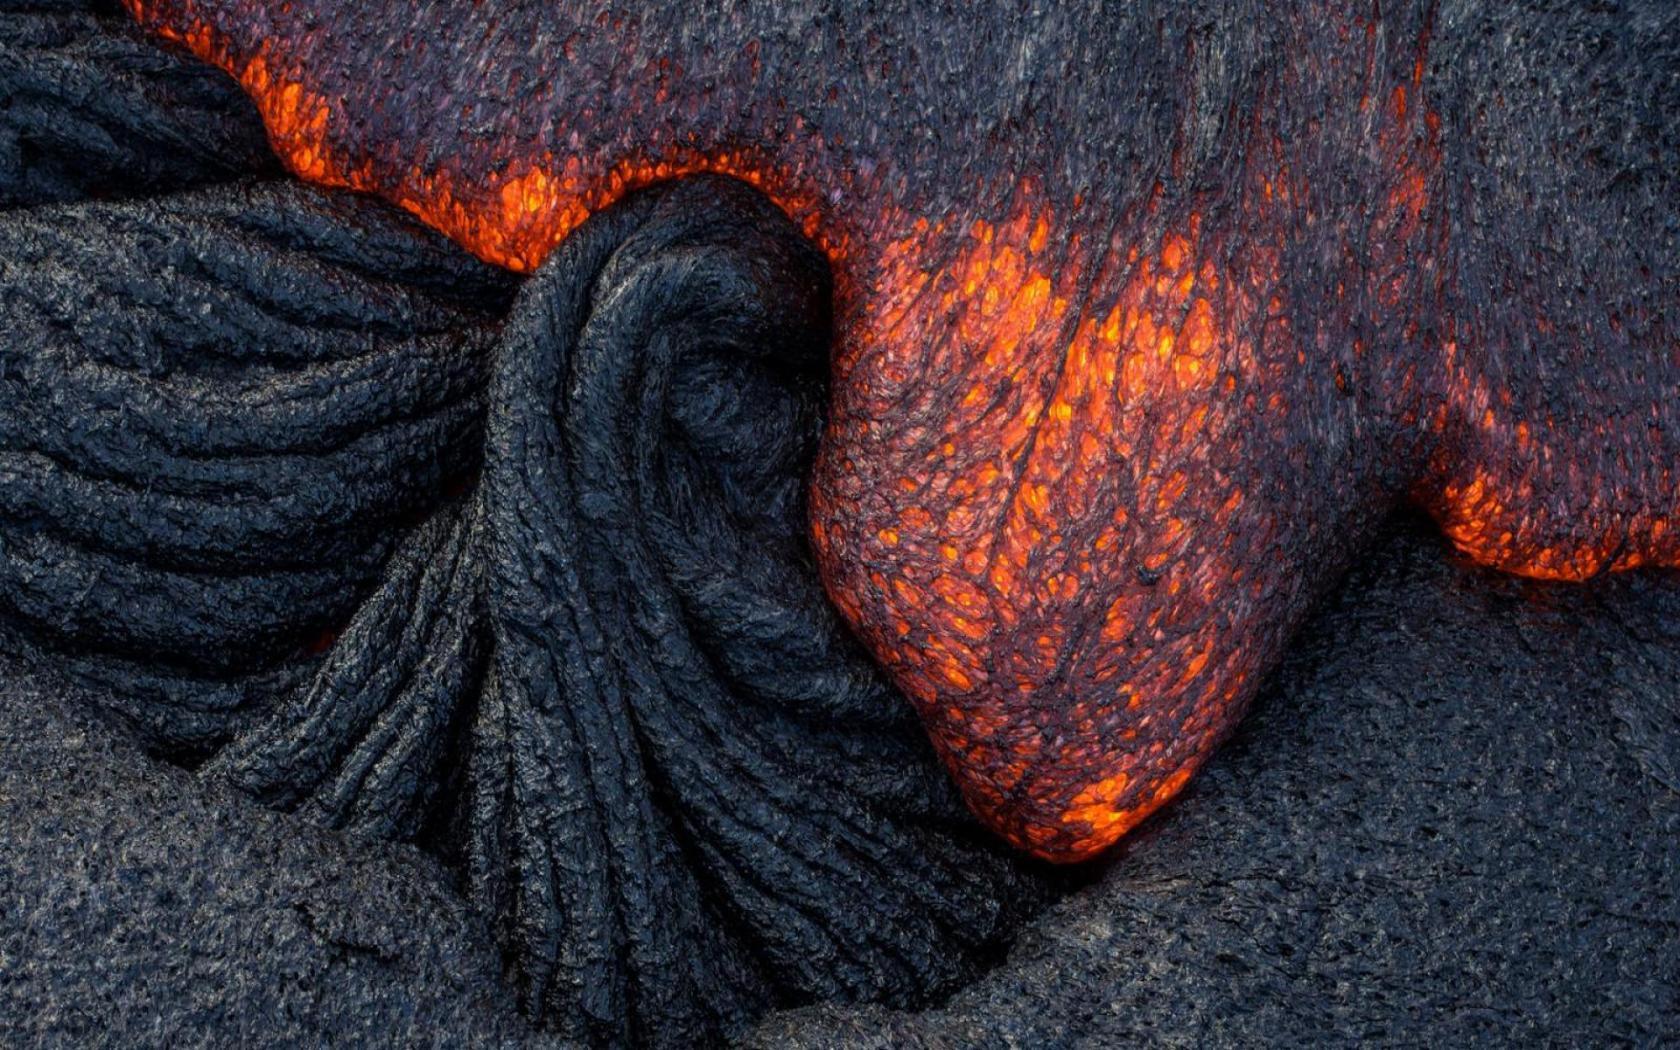 4k lava pictures